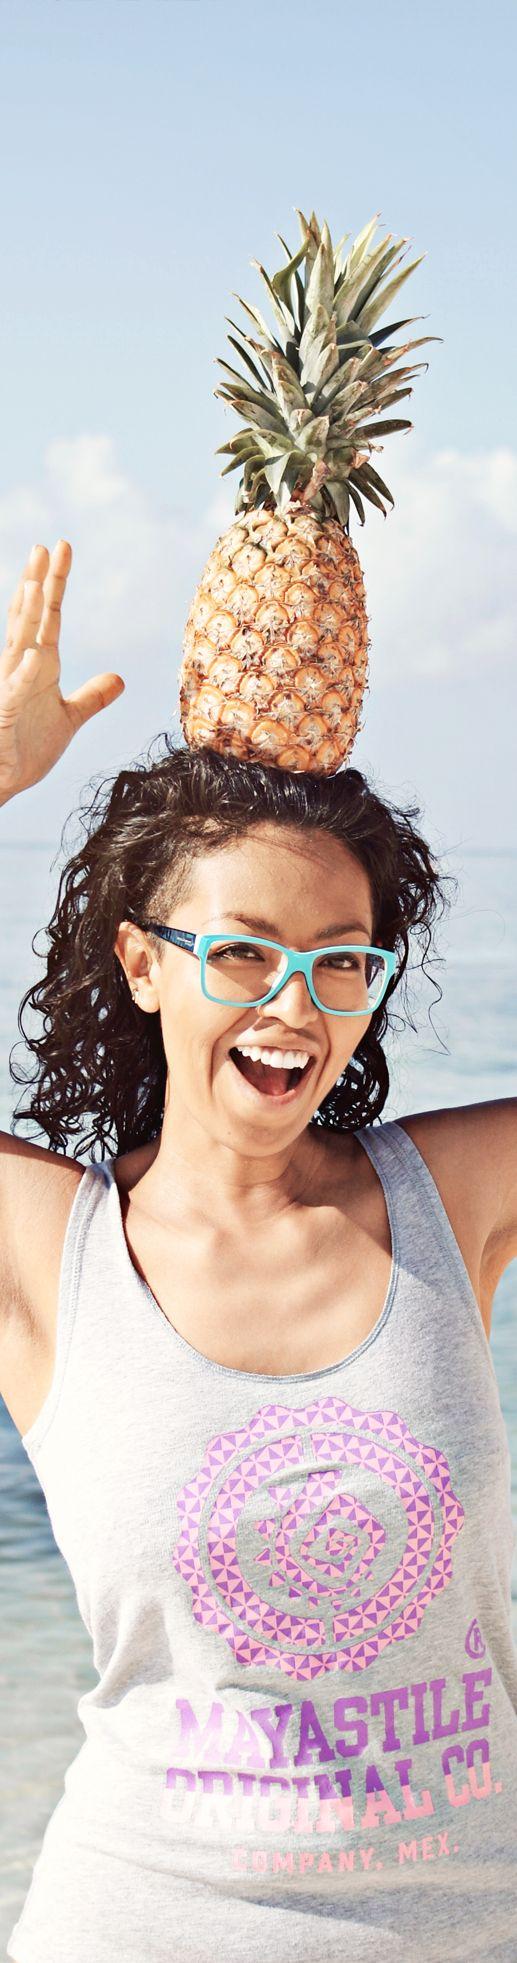 Maystile Tank Top #tanktop #summer #pineapple #playadelcarmen #model #beach